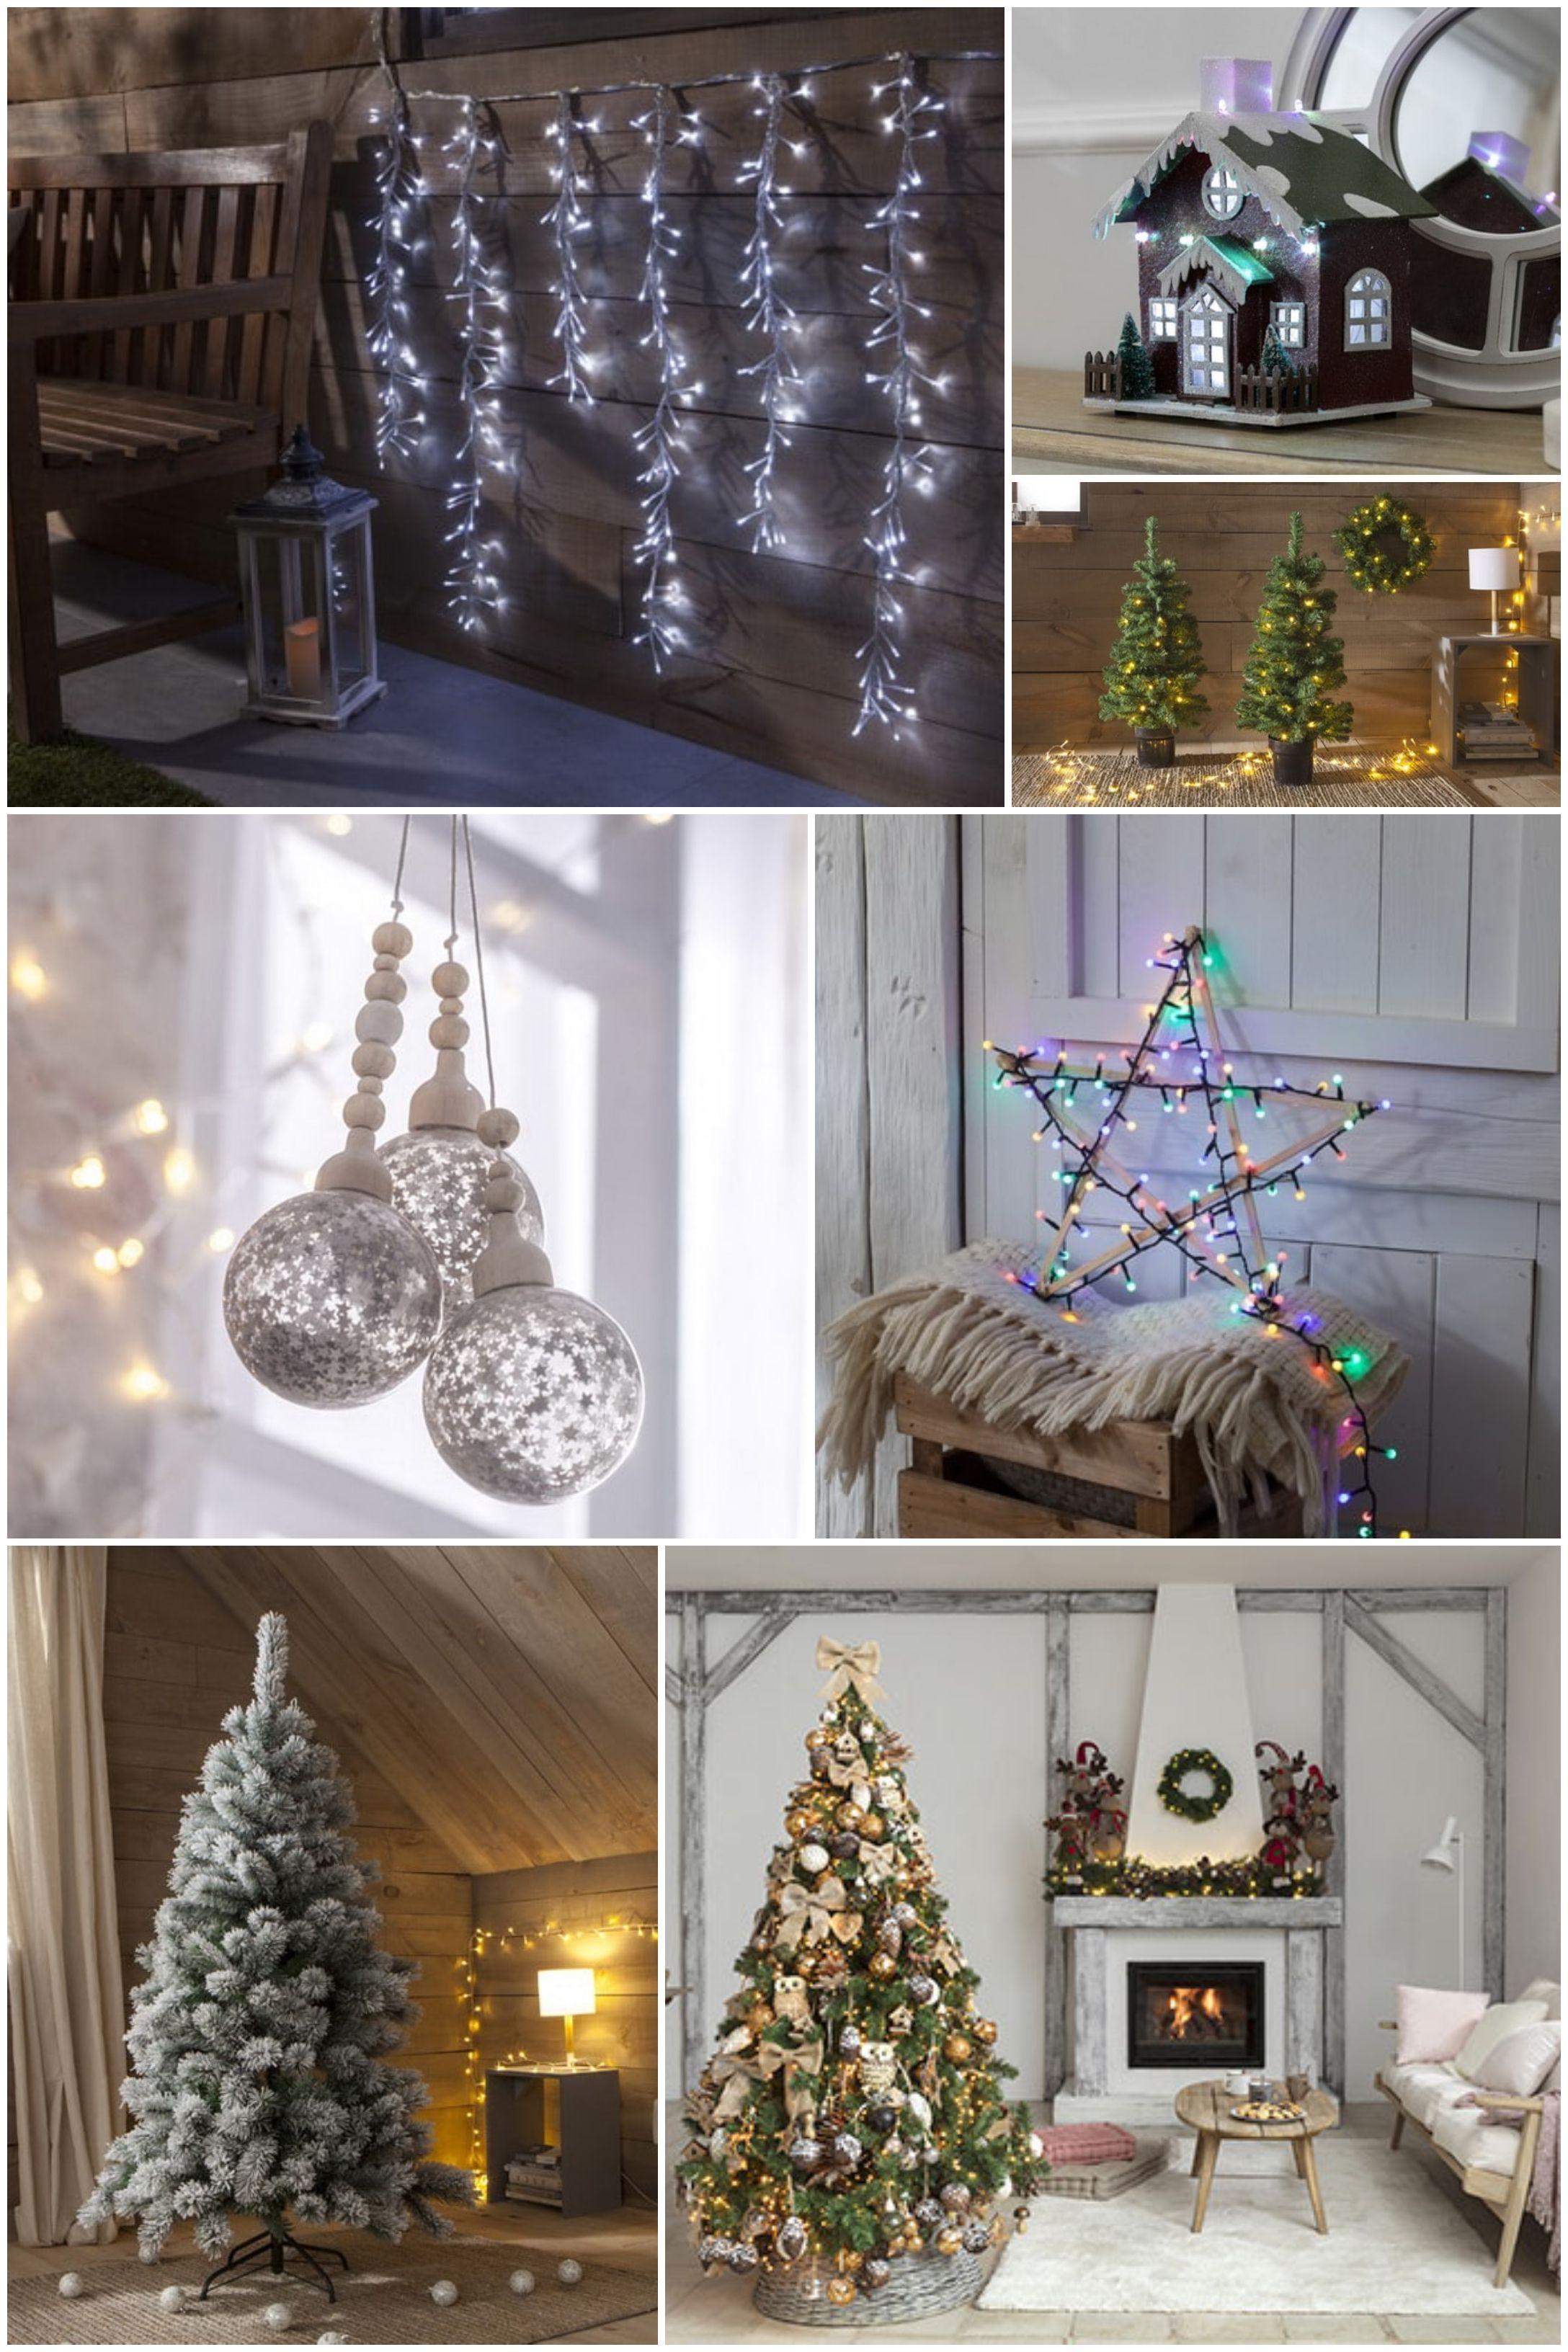 Catálogo Leroy Merlín Navidad 2019 Decoración Navidad Navidad Decoracion Navidad Decoración De Navidad